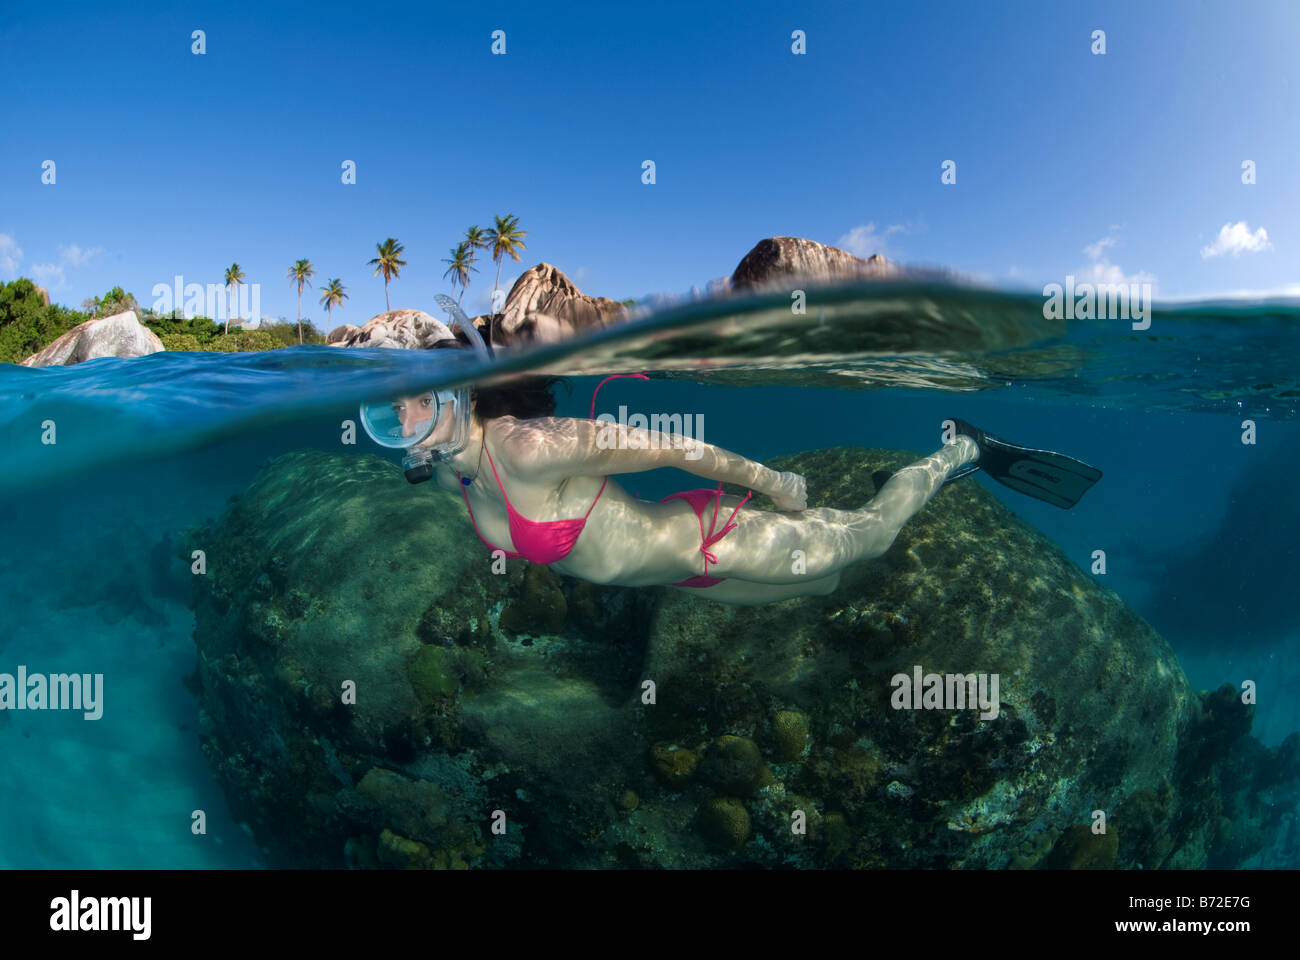 Lo snorkeling in Bagni beach, Isole Vergini Britanniche, femmina sub, maschera ovale, bikini, acqua azzurra, acqua Foto Stock